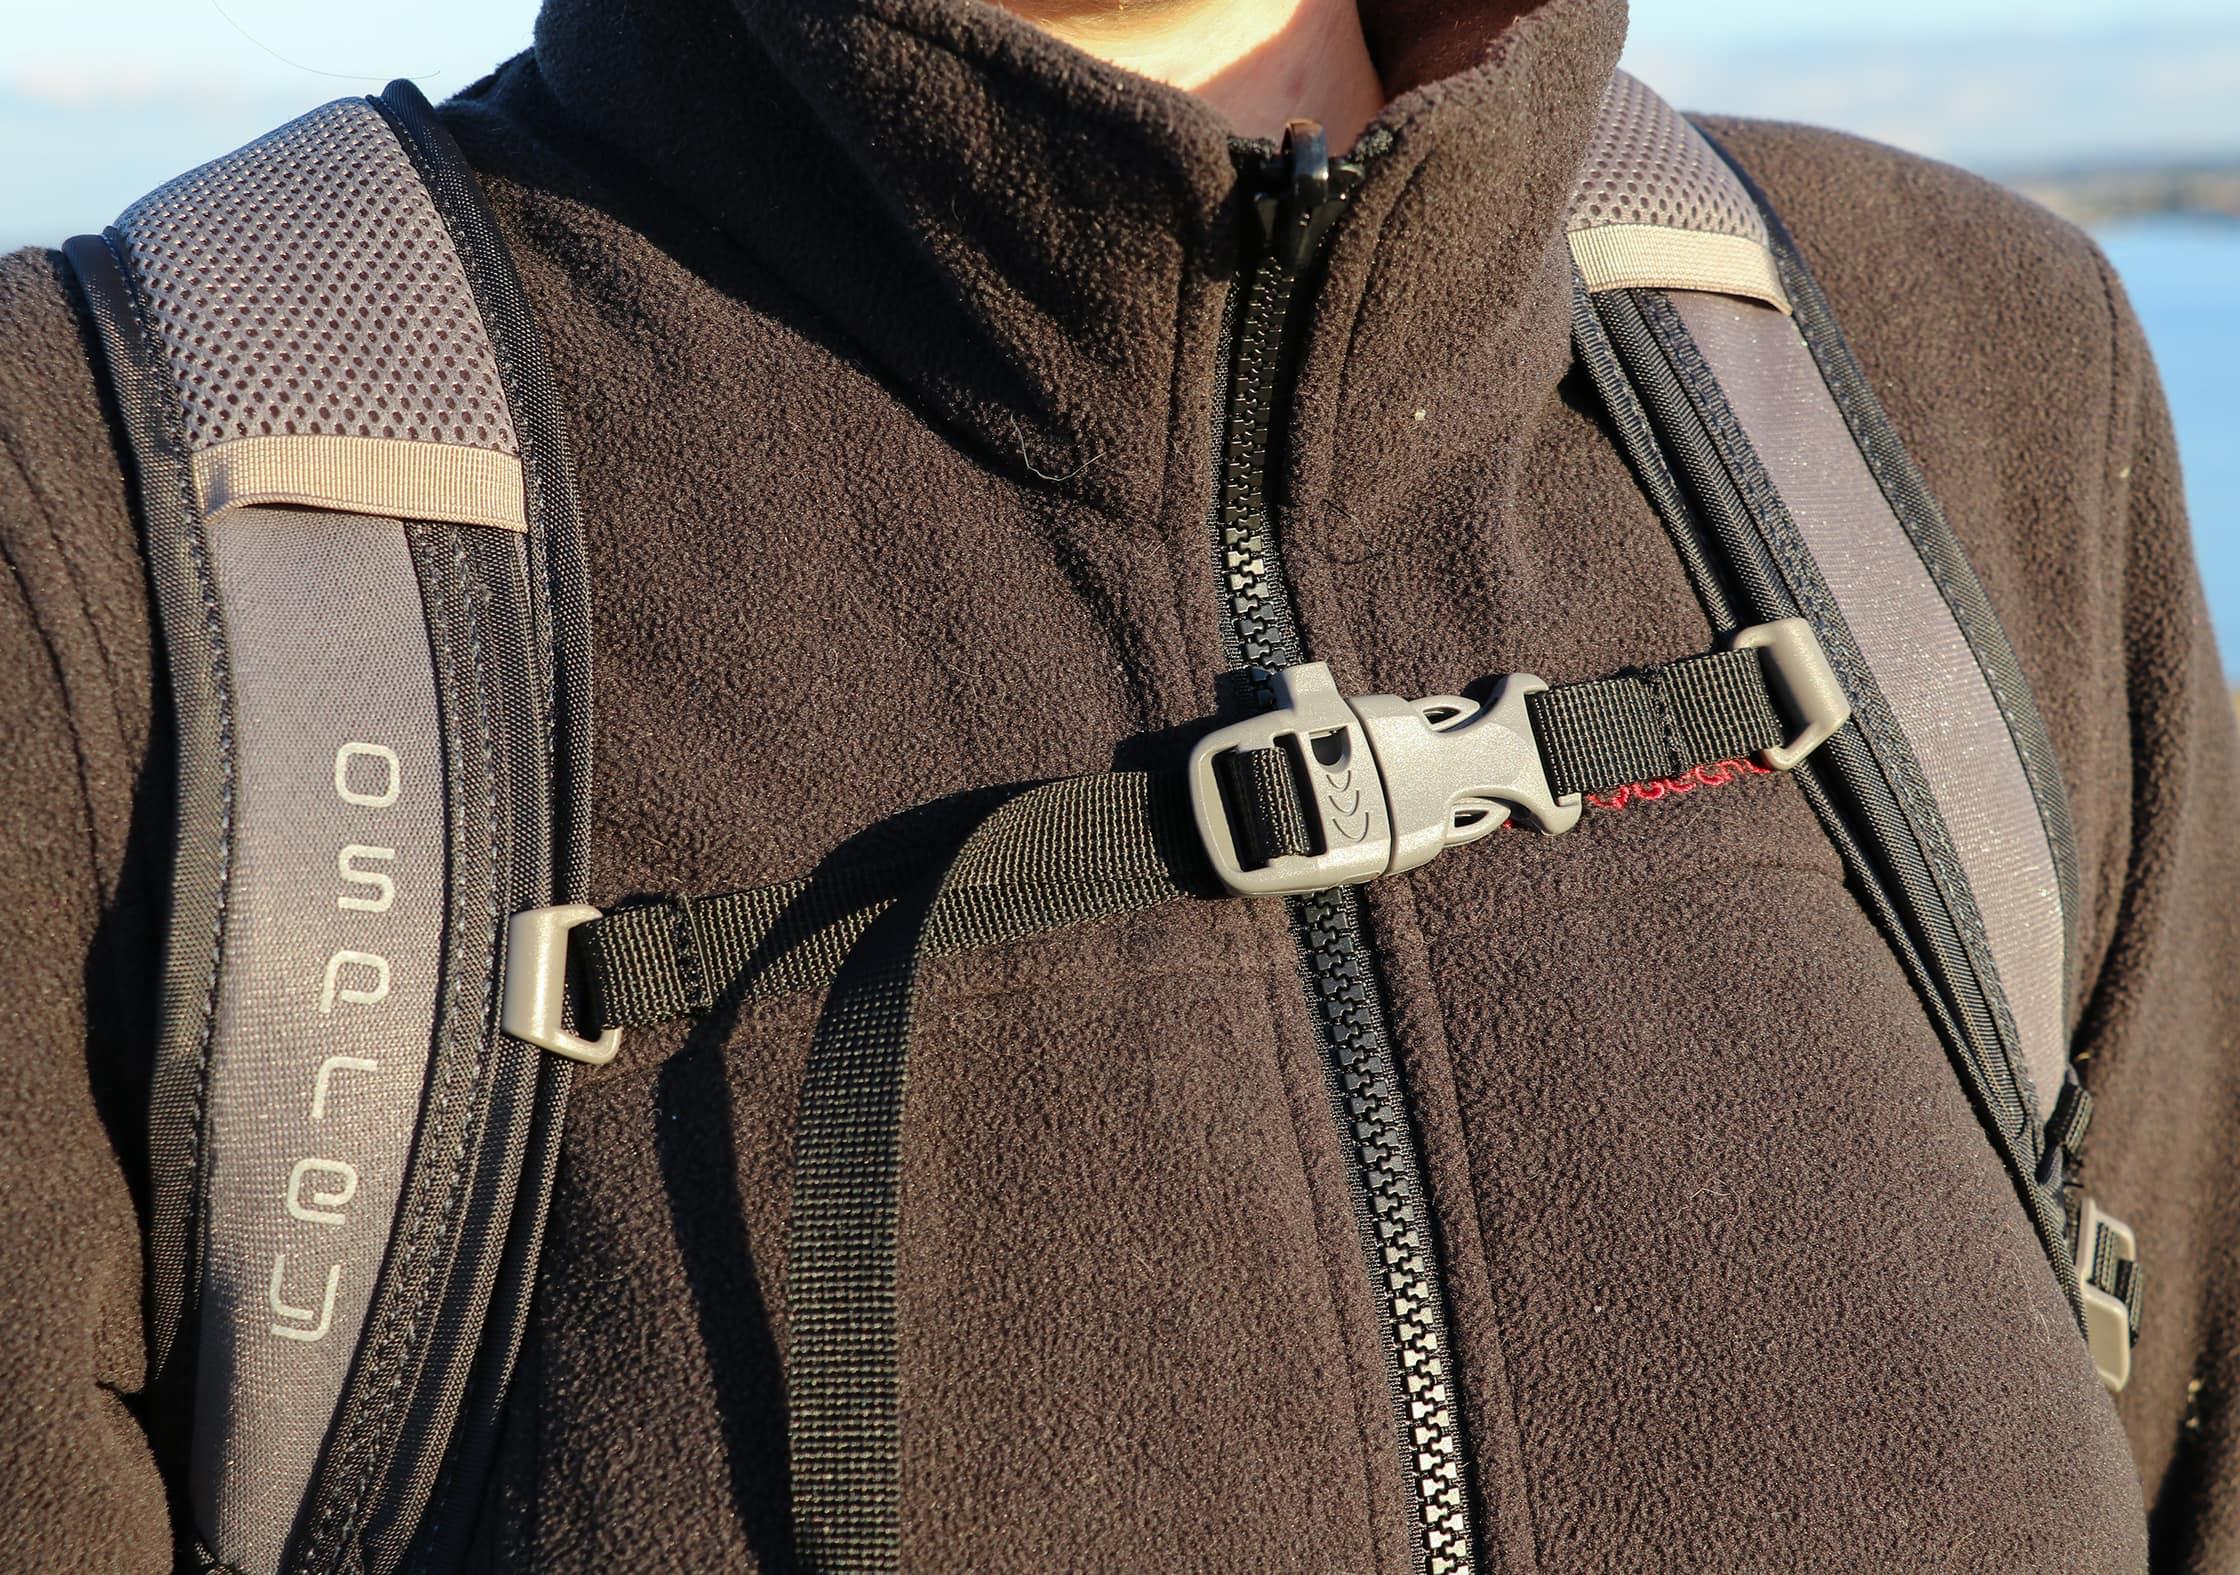 Osprey Daylite Sternum Strap & Shoulder Straps